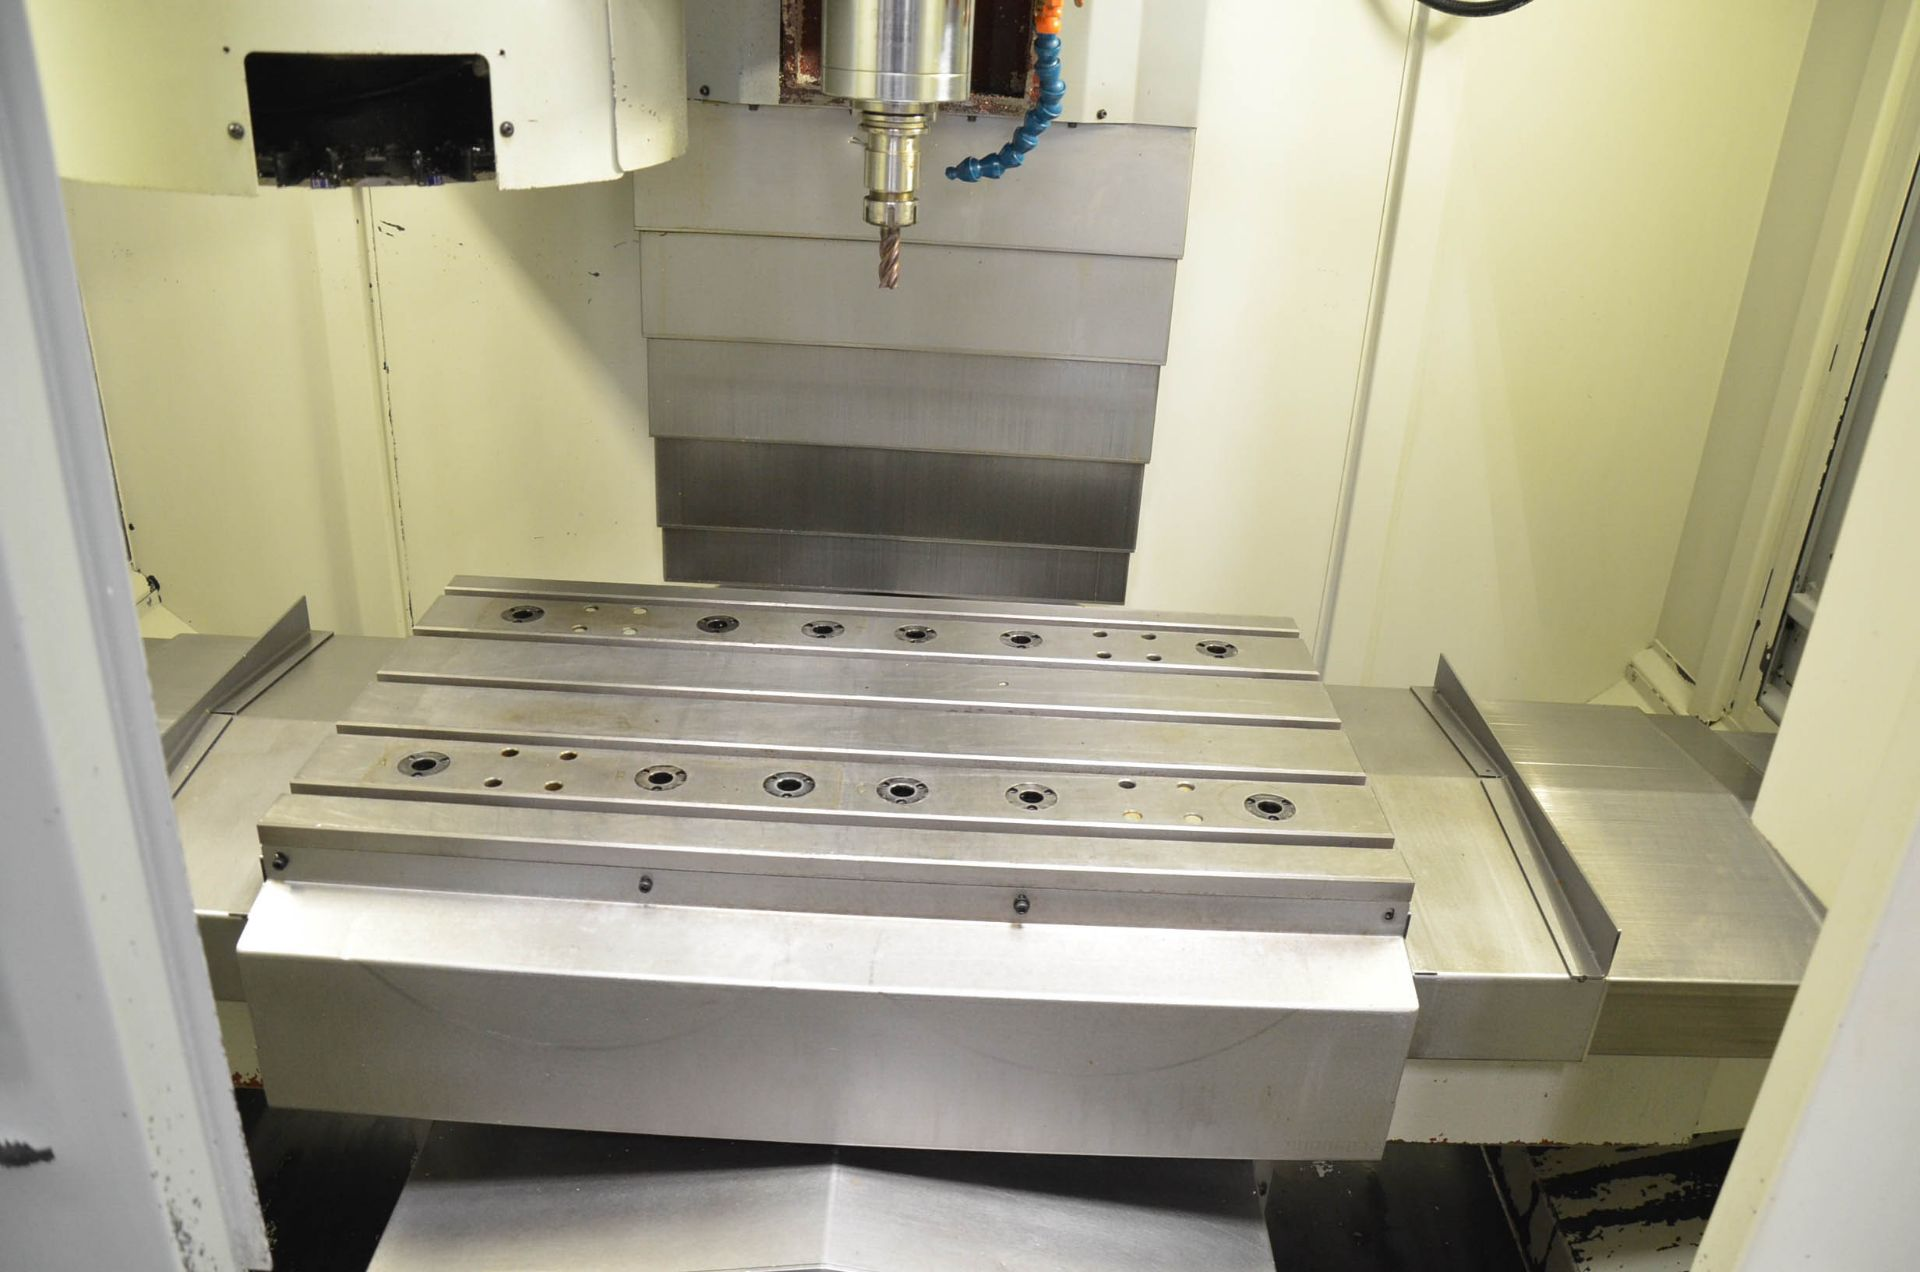 "SWI (2013) TRAK LPM CNC VERTICAL MACHINING CENTER WITH PROTO TRAK PMX CNC CONTROL, 19.5"" X 35.5"" - Image 5 of 9"